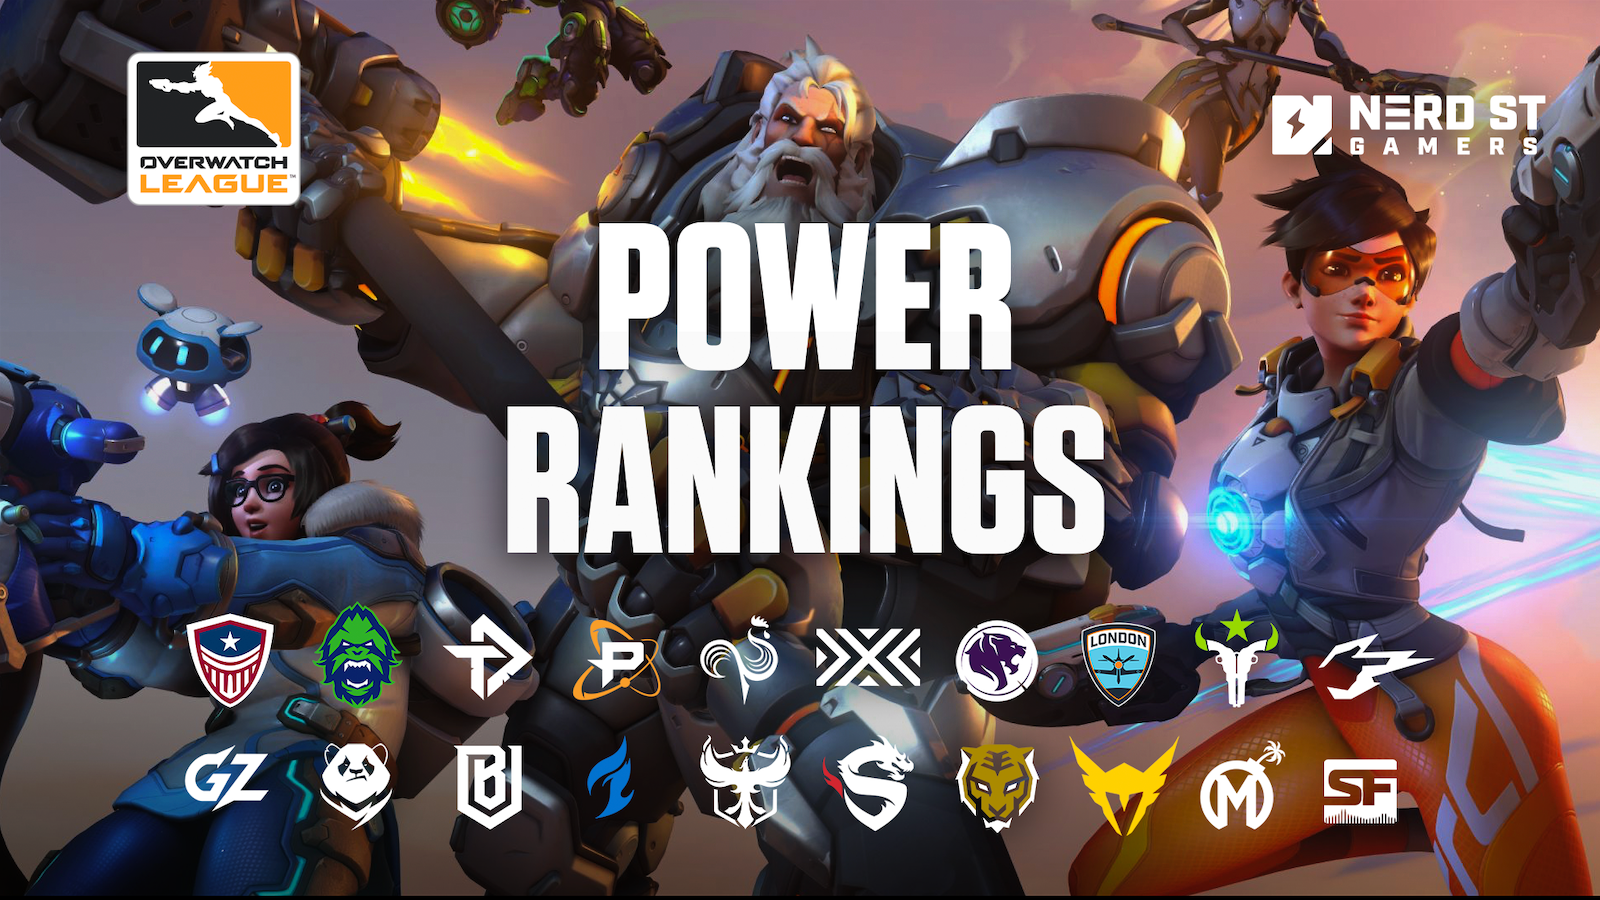 Overwatch League Power Rankings entering June Joust